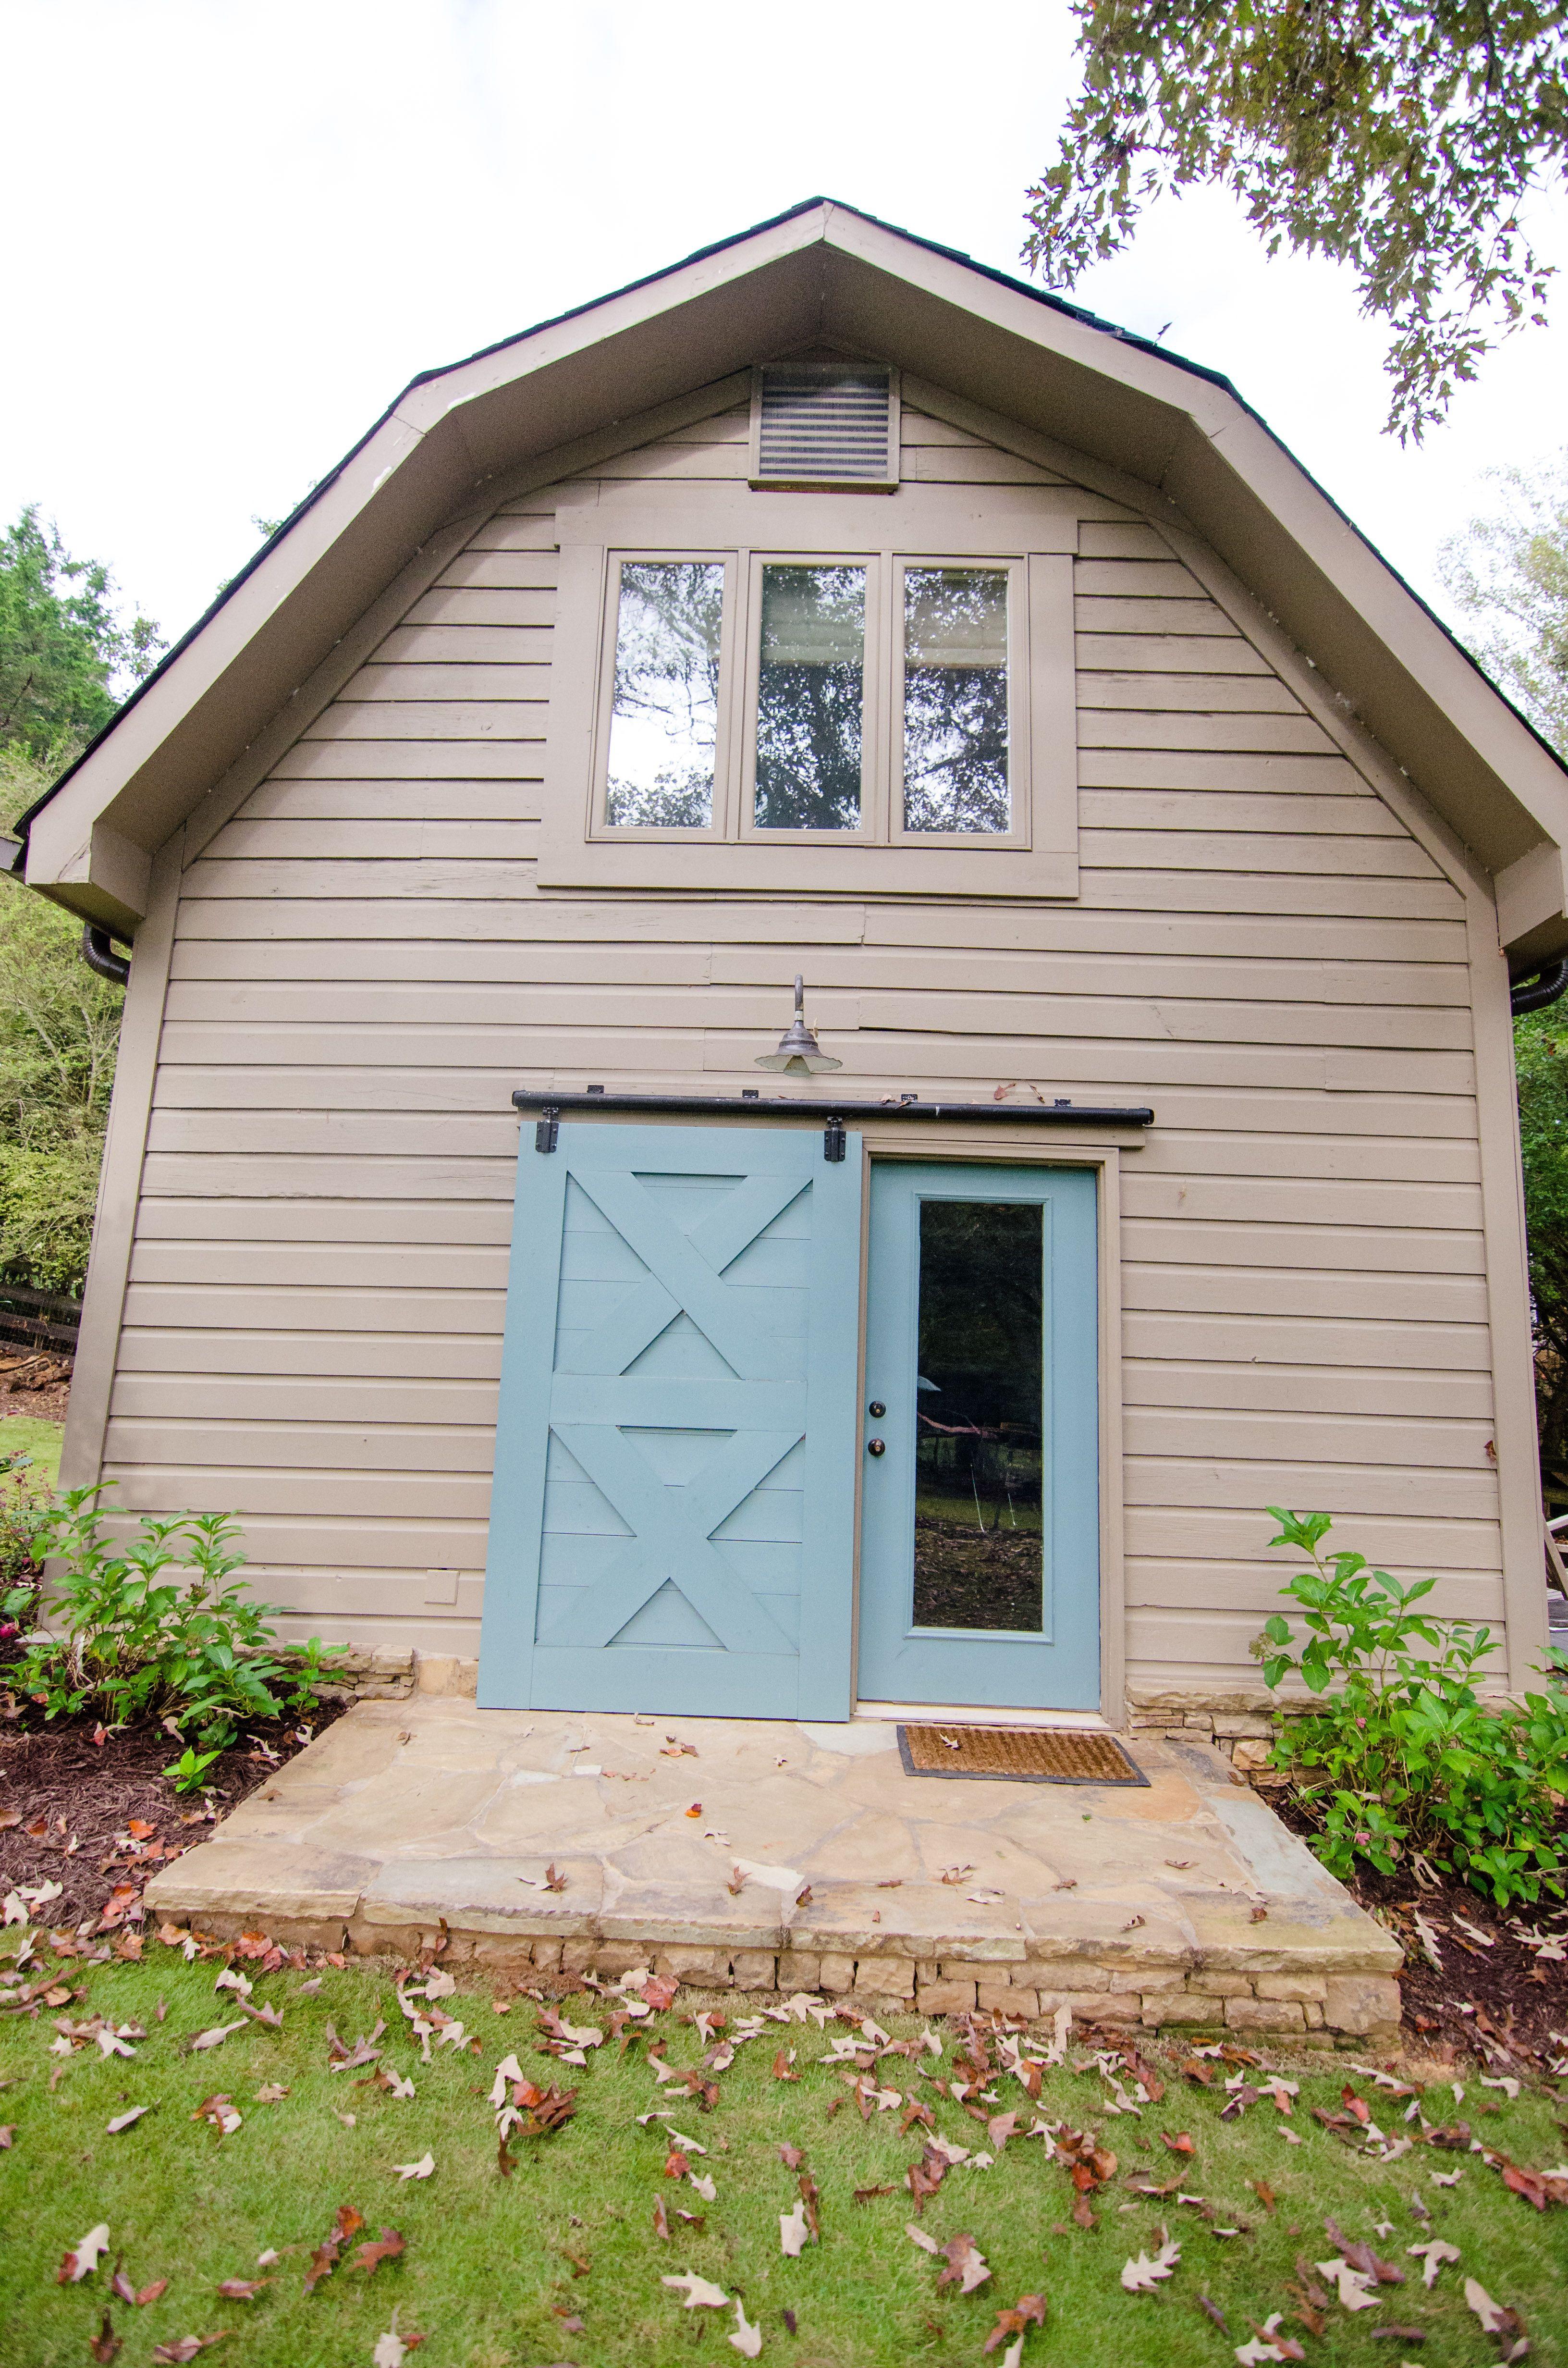 Barn Cabin At The Ark At Lake Lanier 14 Bdrm 12 Bath Near Vrbo